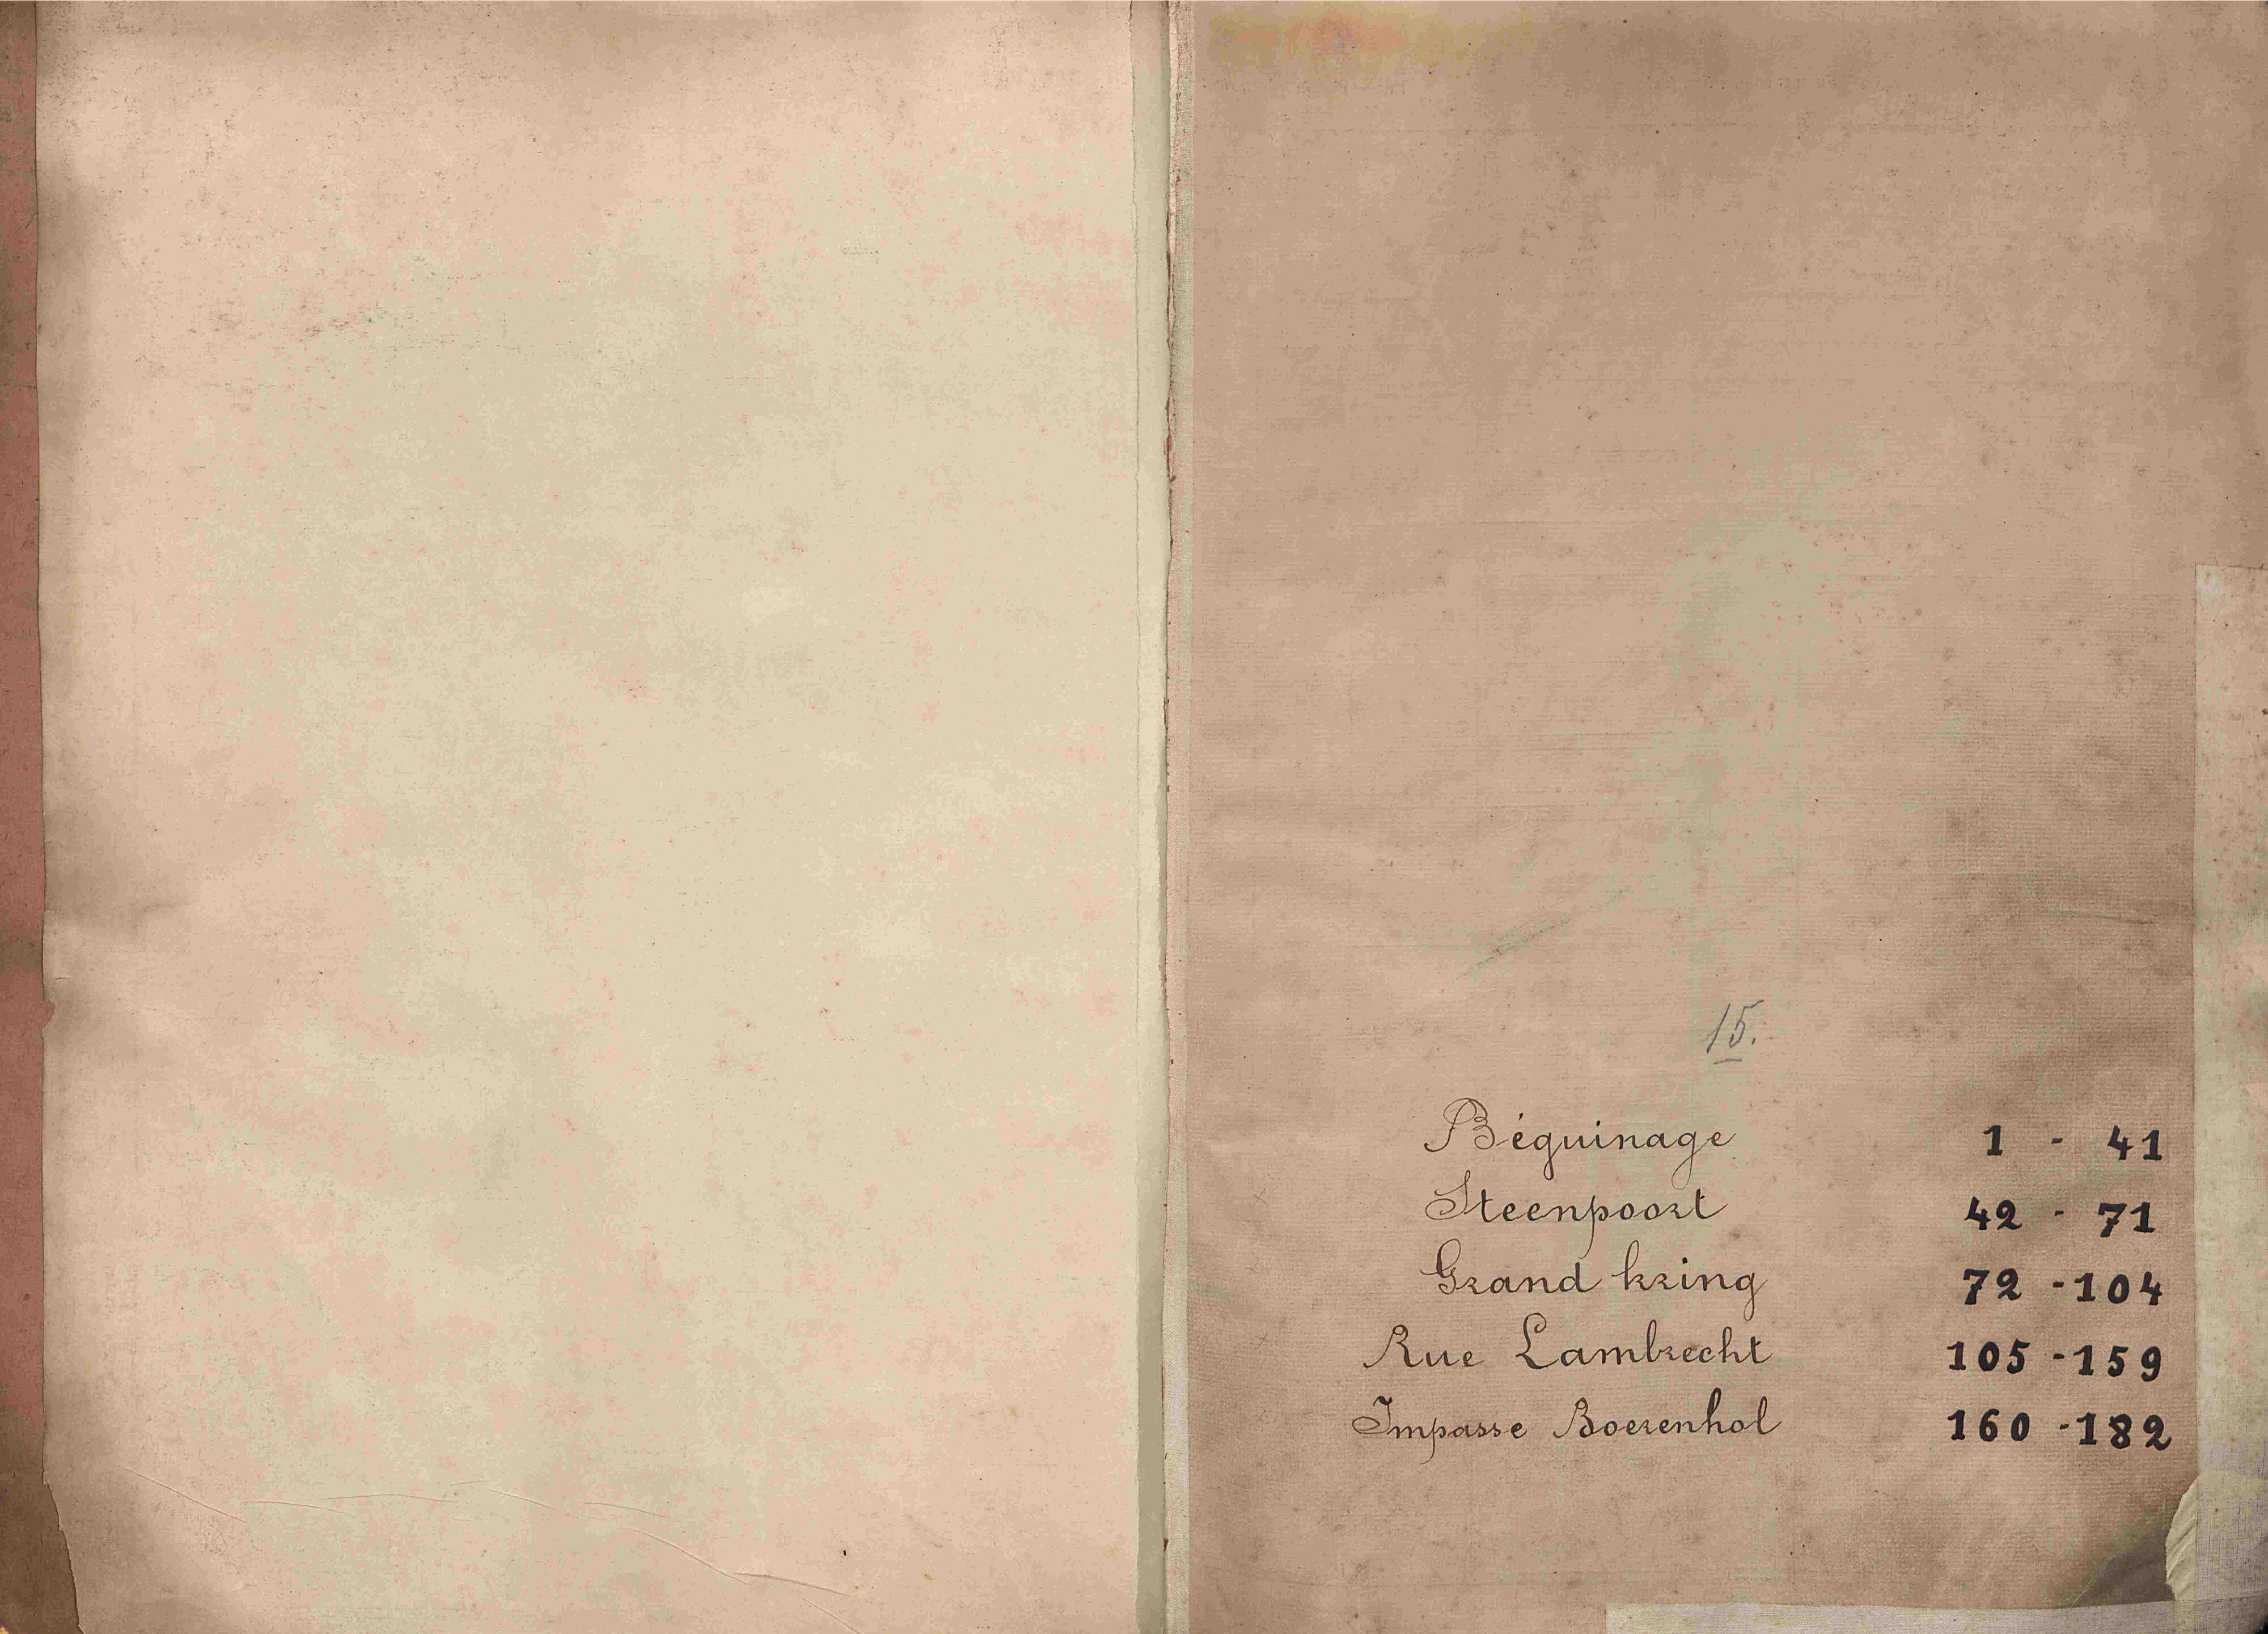 Bevolkingsregister Kortrijk 1890 boek 15